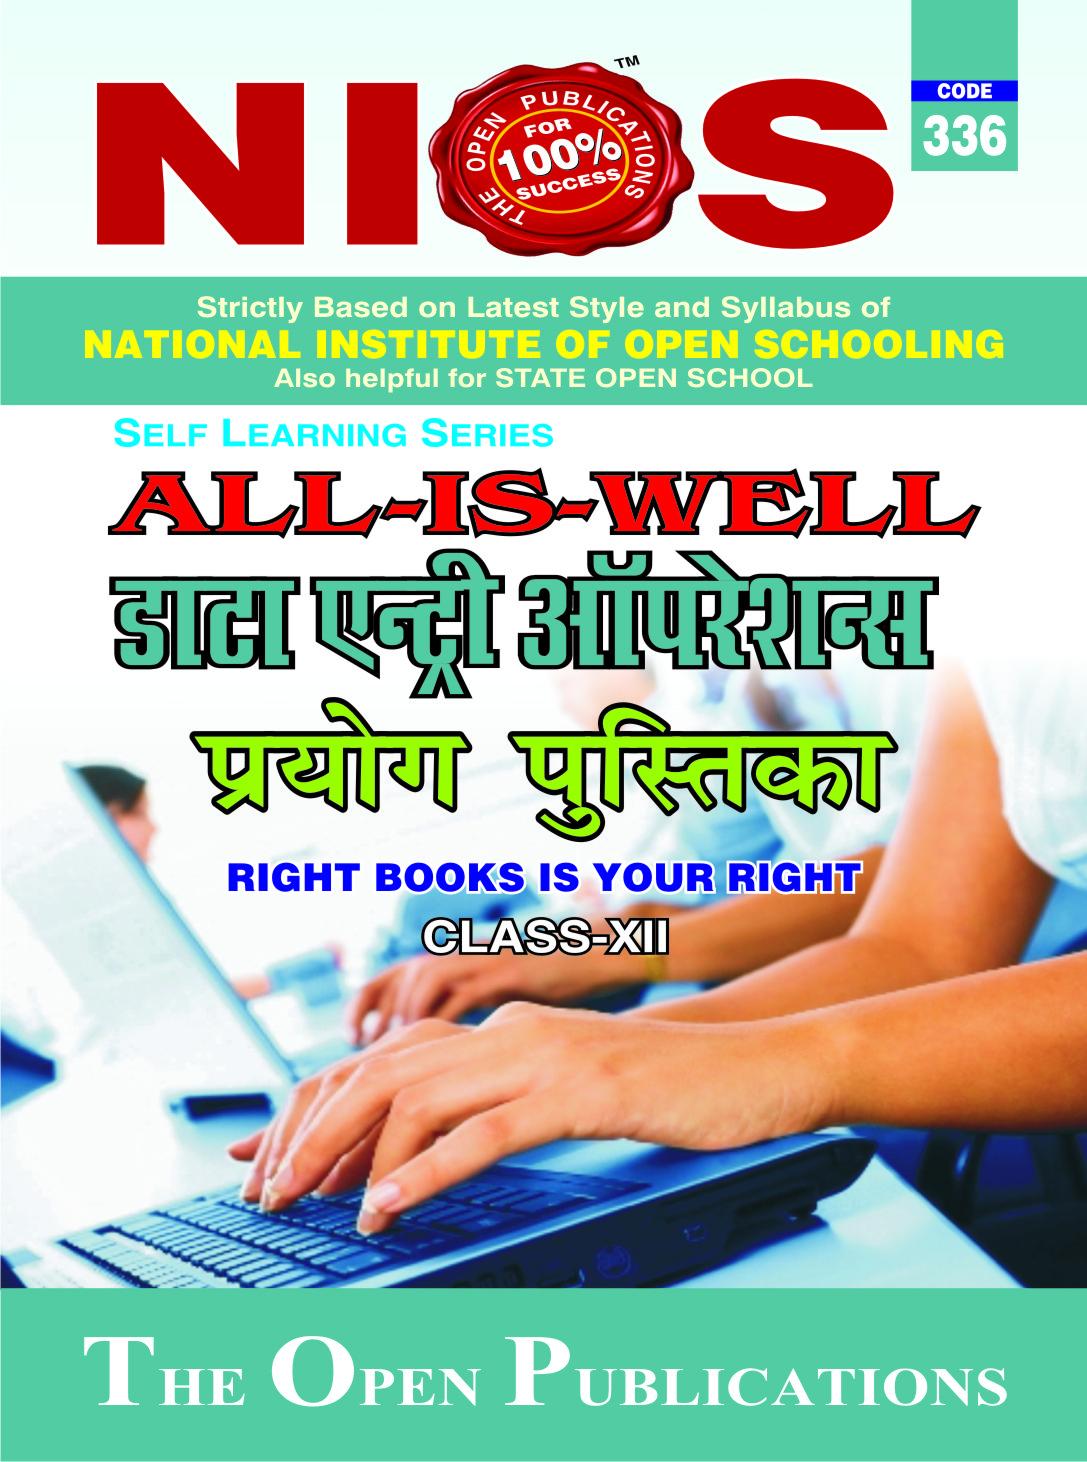 NIOS DATA ENTRY OPERATIONS 336 PRACTICAL MANUAL HELP BOOK IN HINDI MEDIUM